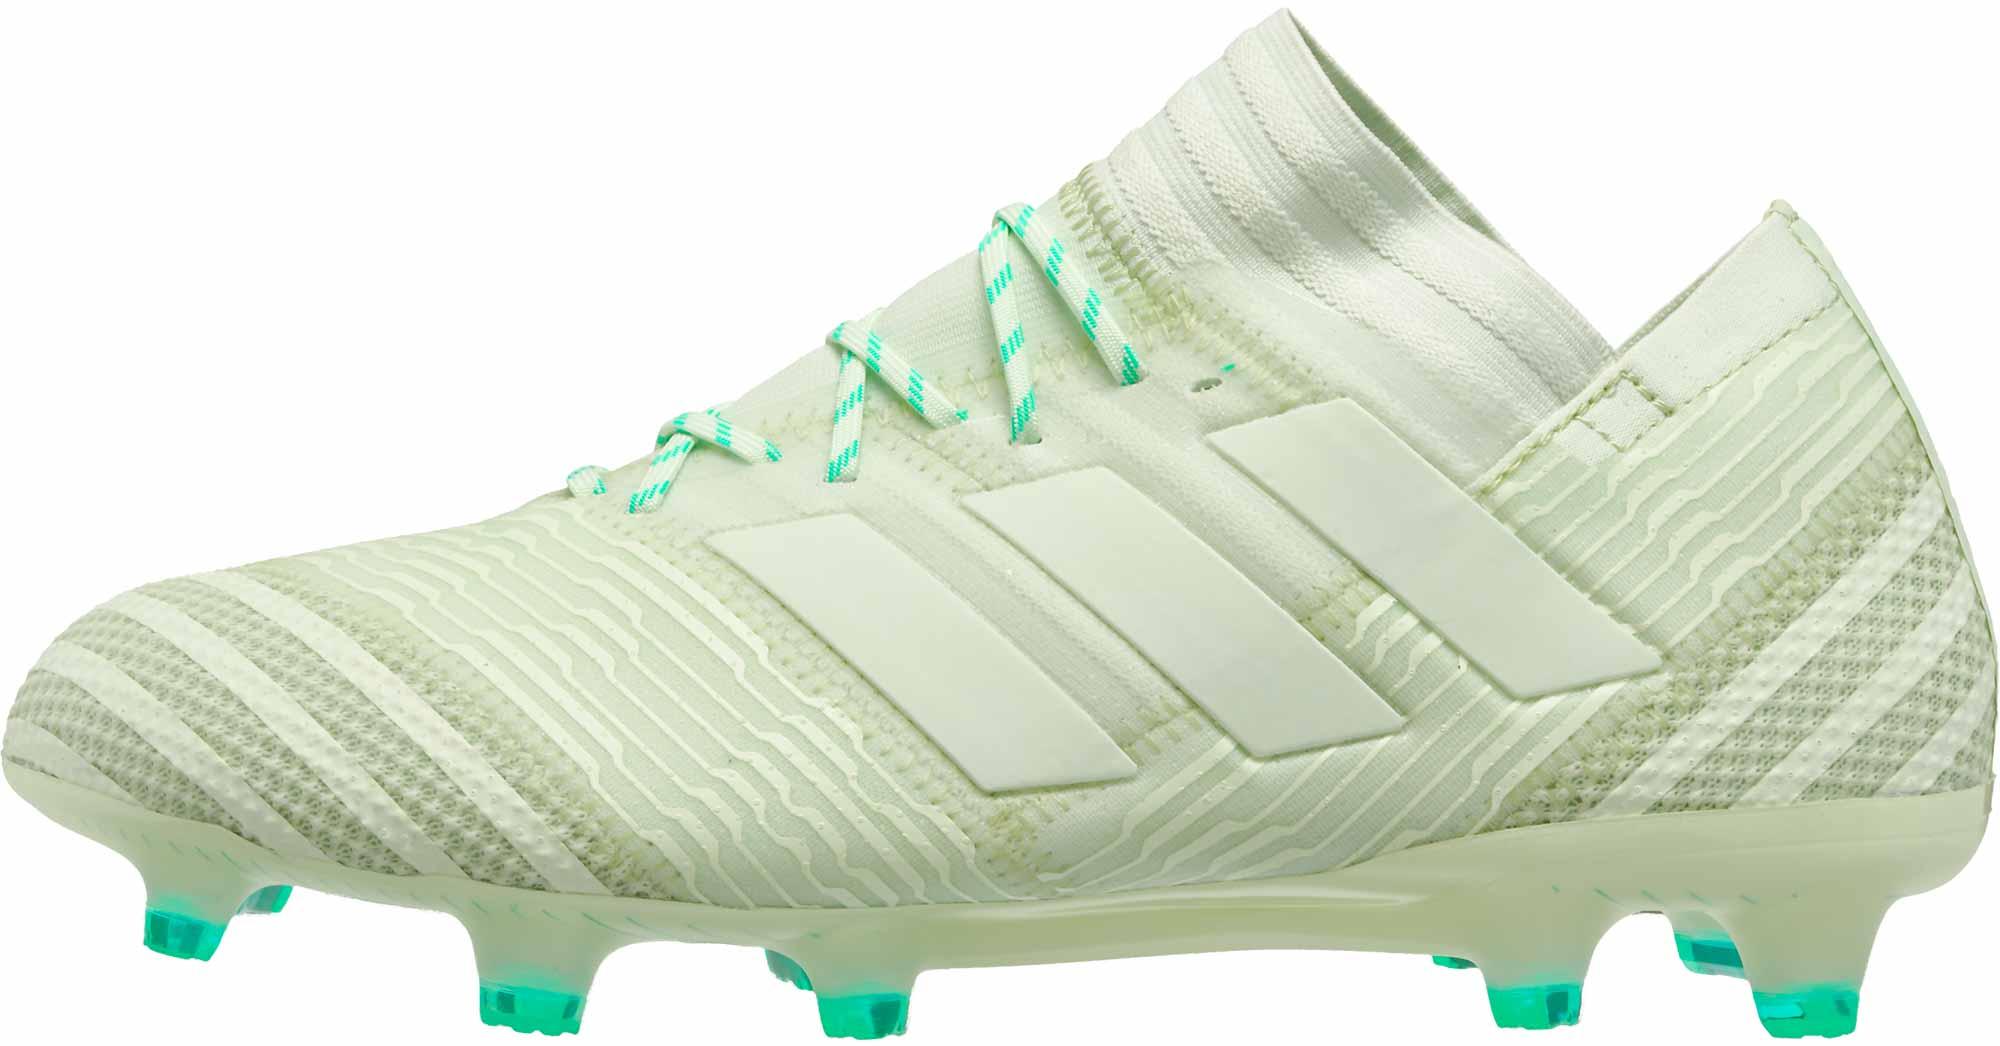 2d3353323 adidas Nemeziz 17.1 FG - Aero Green - SoccerPro.com